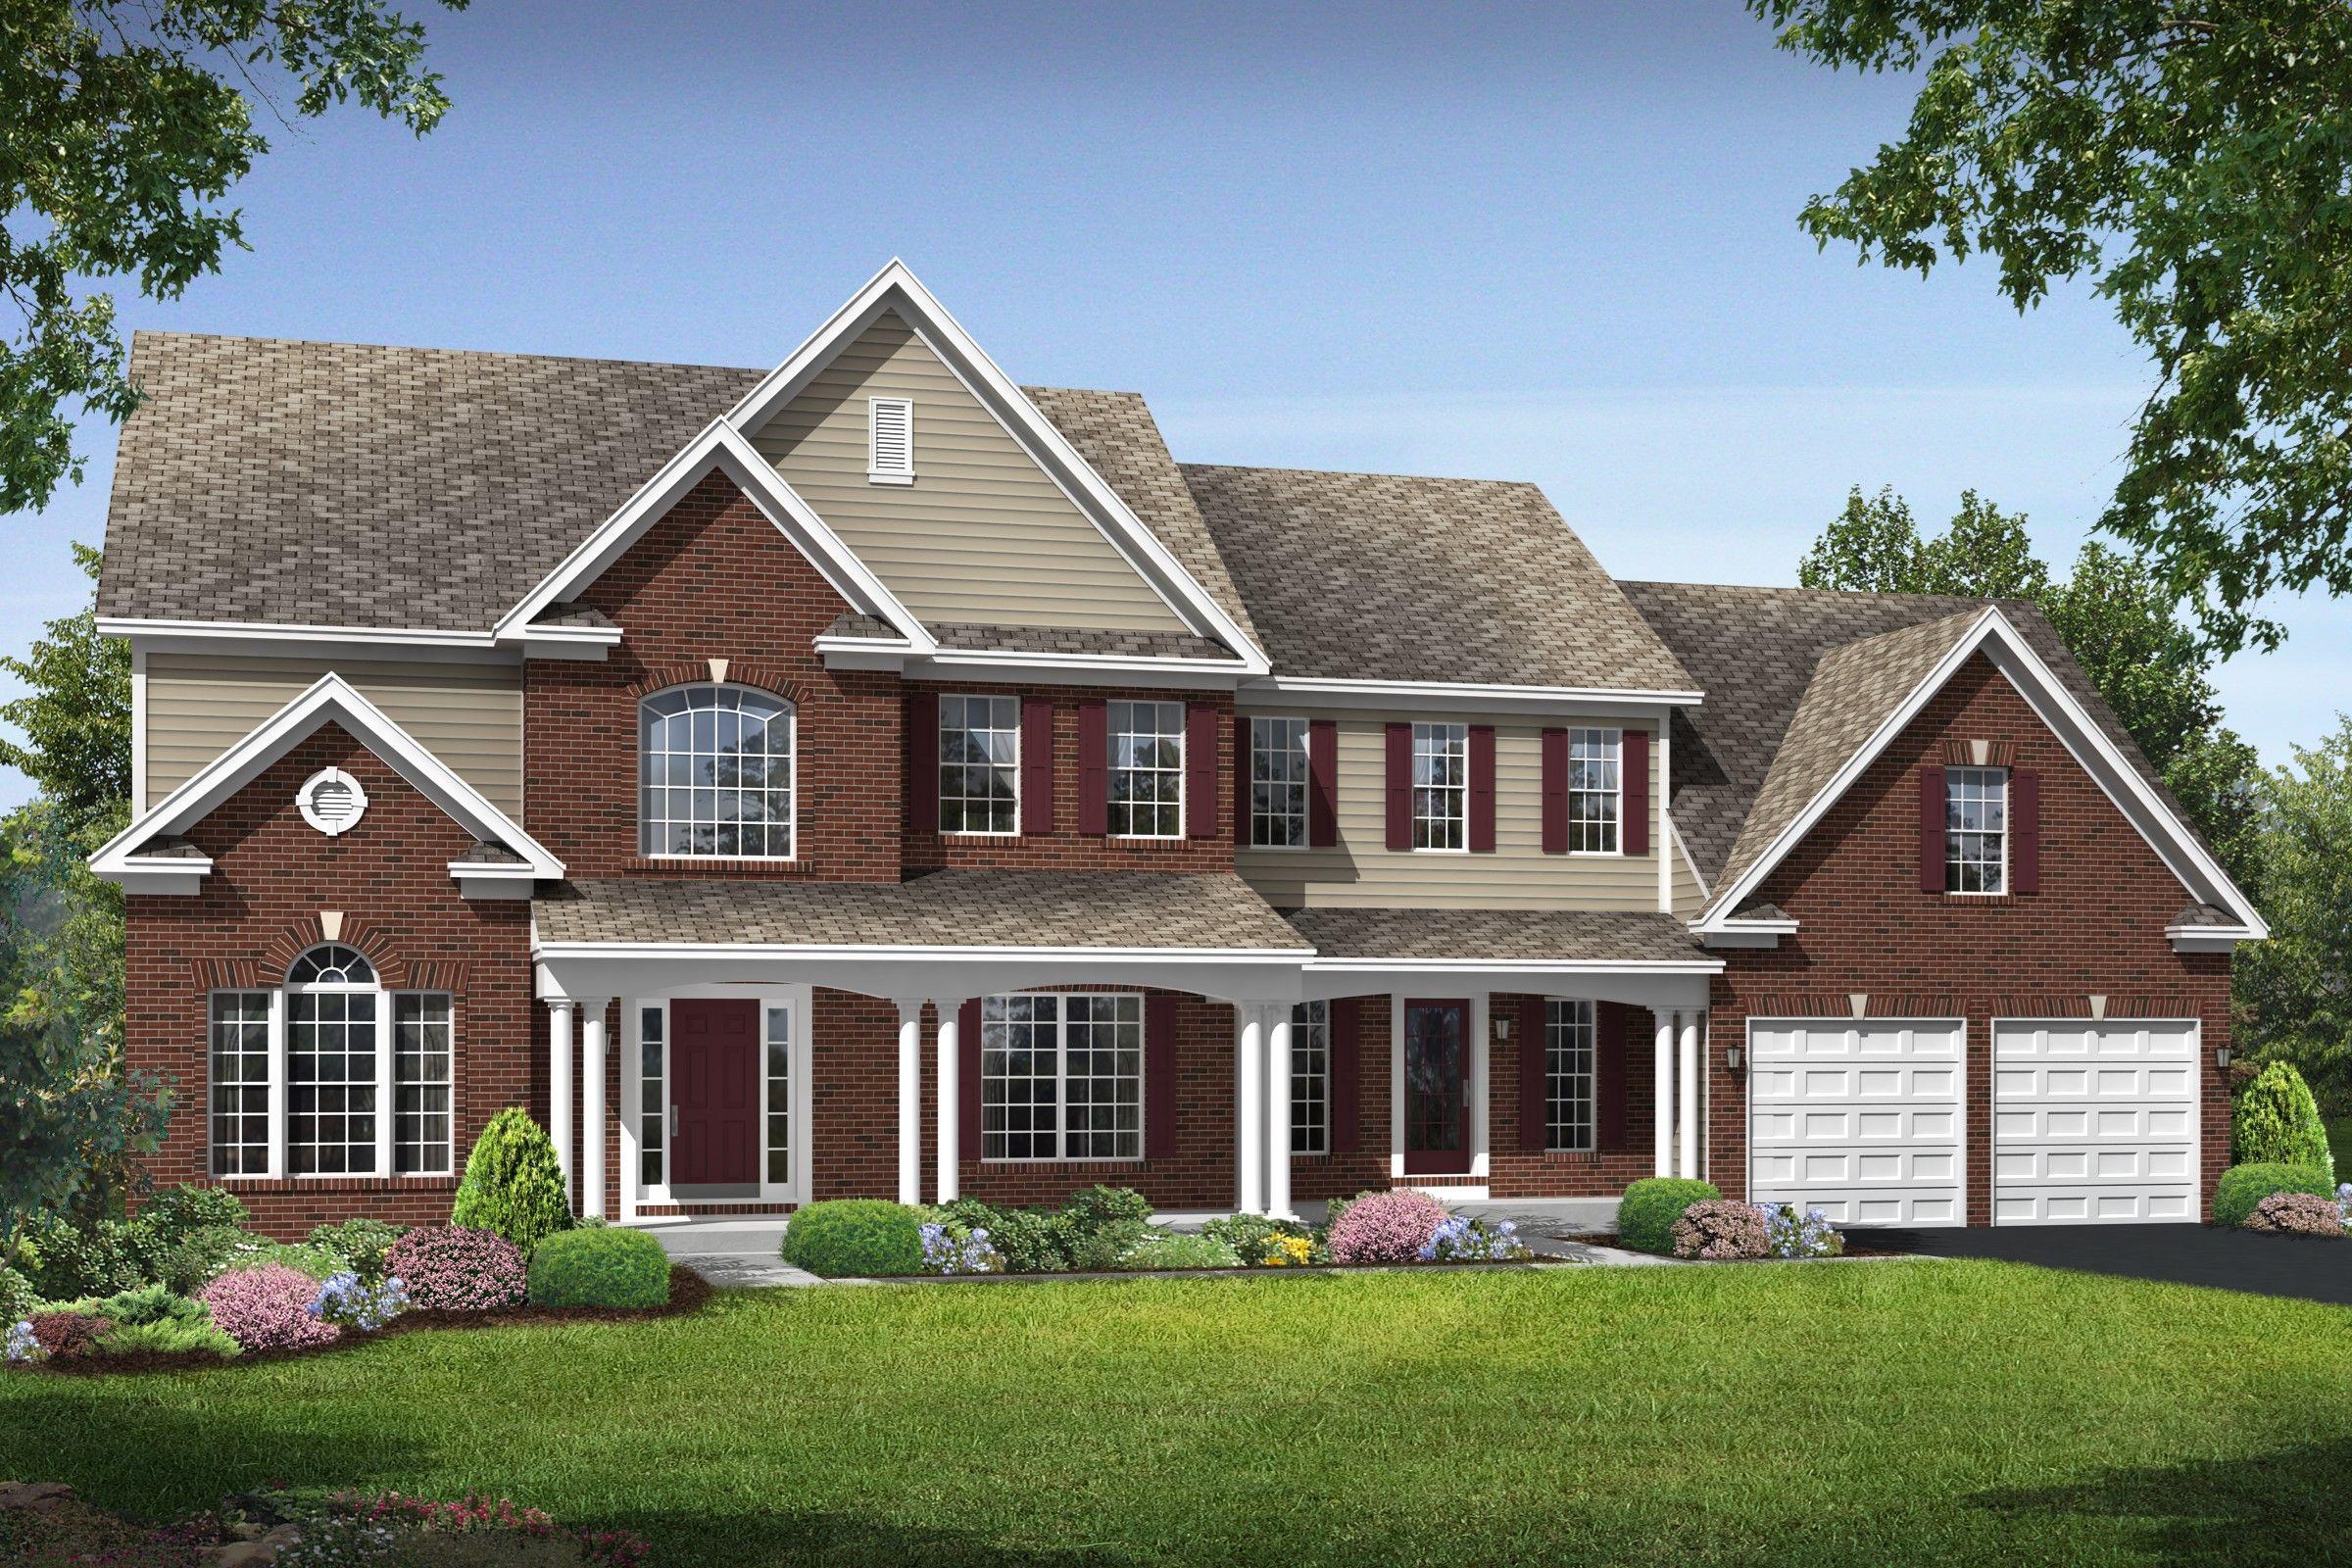 5 Perth Drive, Fredericksburg, VA Homes & Land - Real Estate